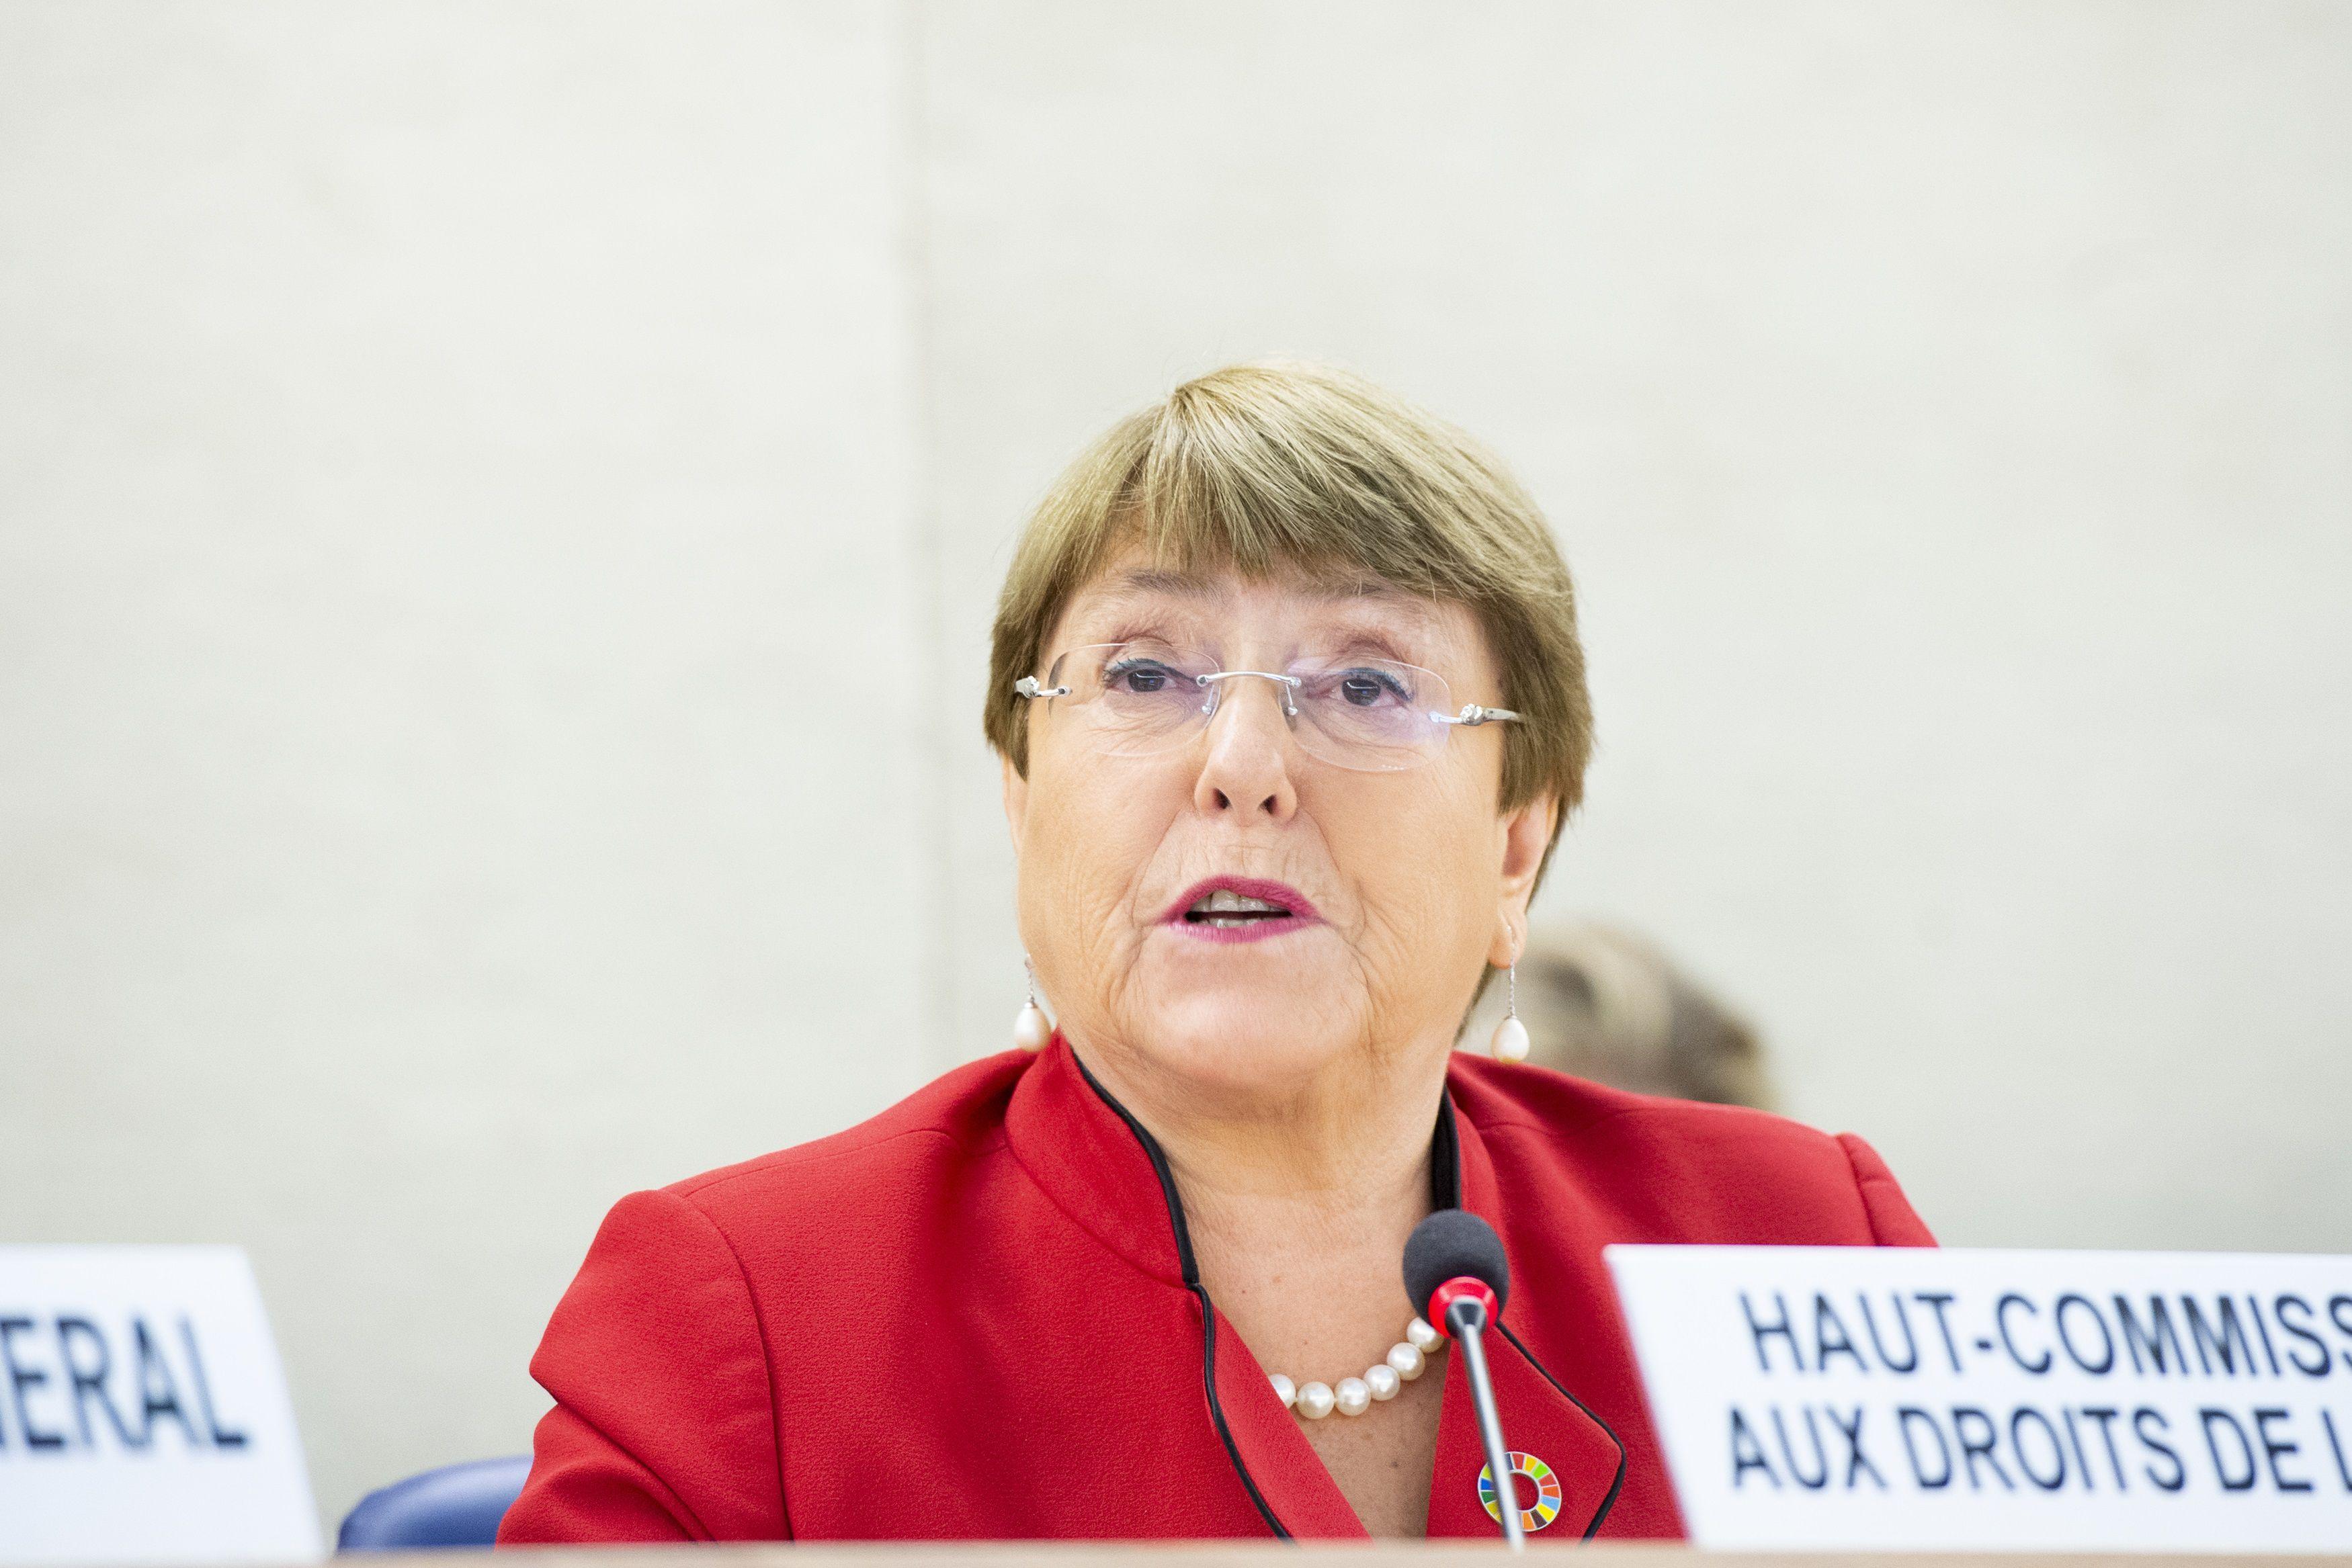 24/02/2020 Michelle Bachelet POLITICA INTERNACIONAL UN PHOTO/VIOLAINE MARTIN